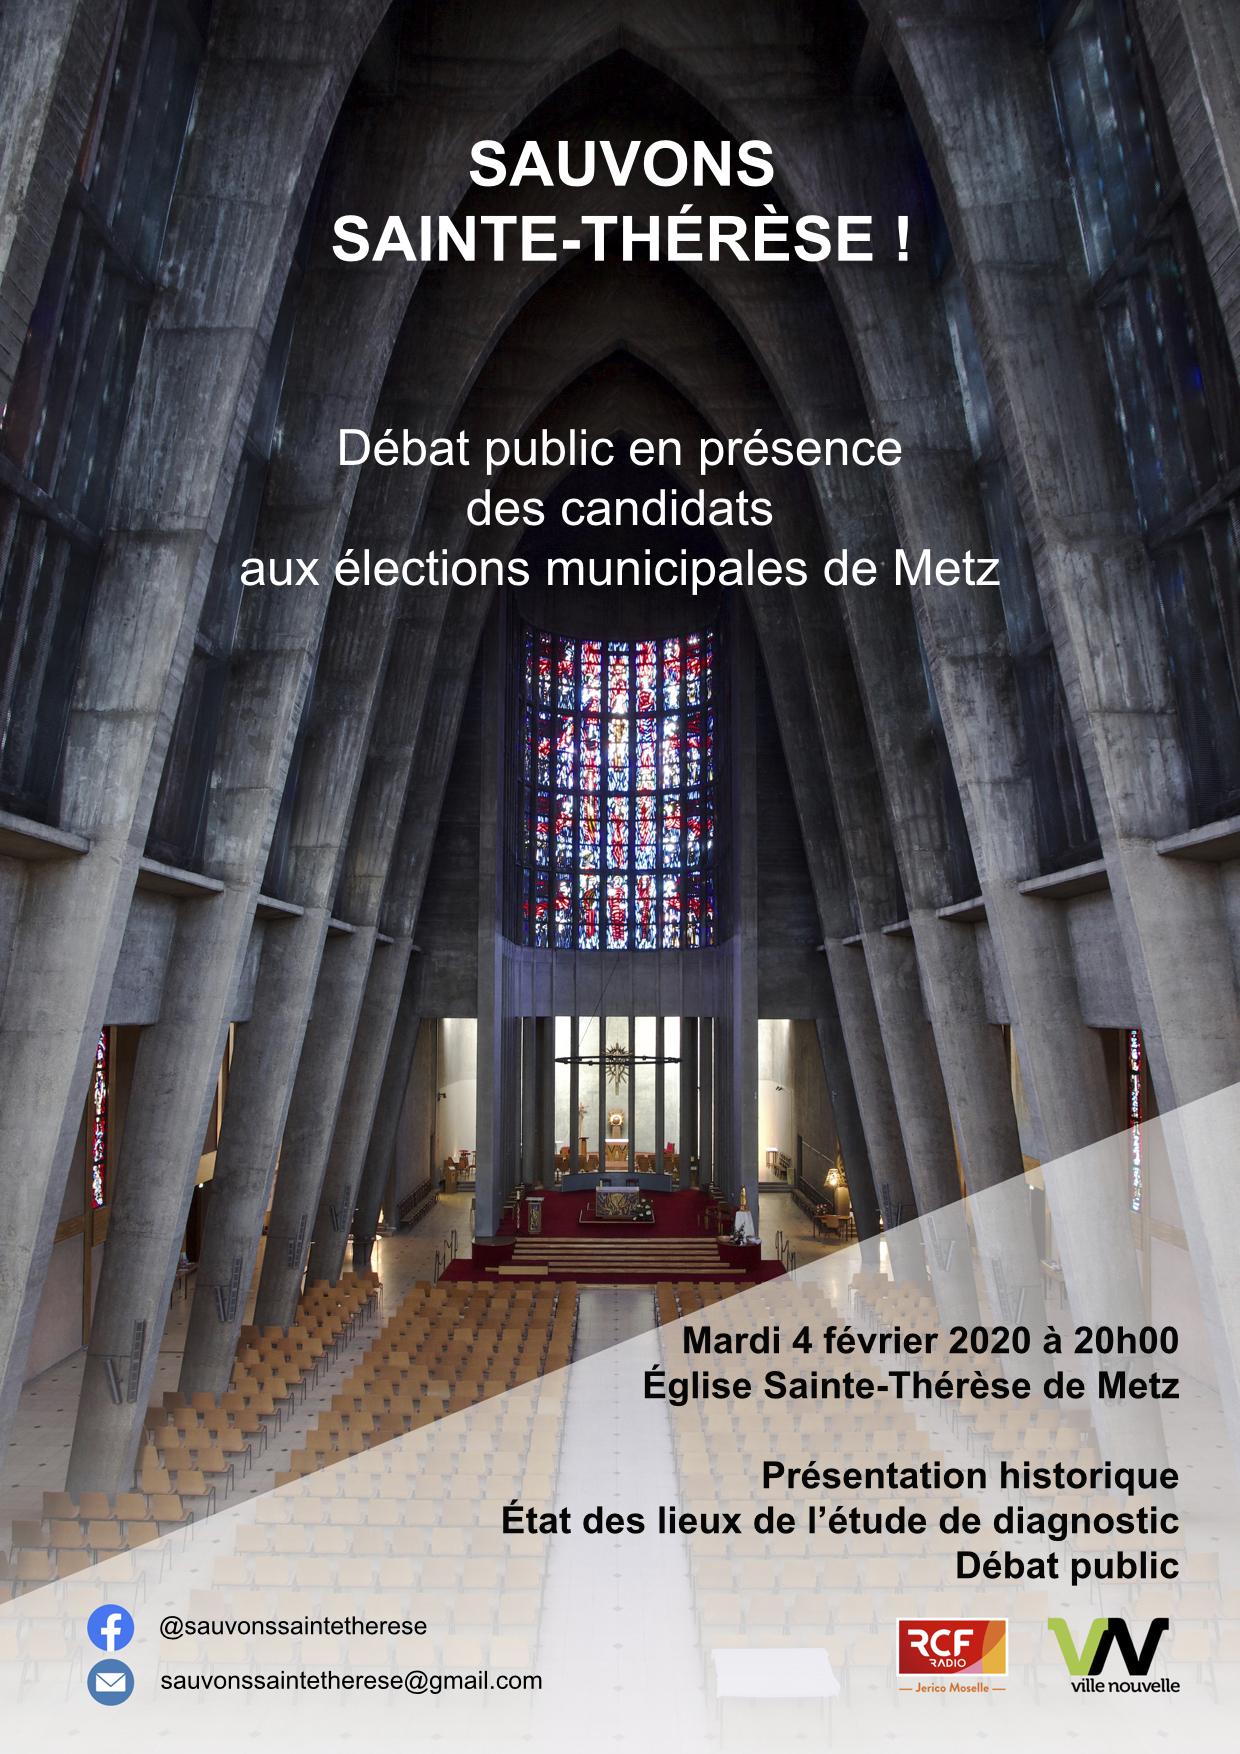 Sauvons Sainte-Thérèse !